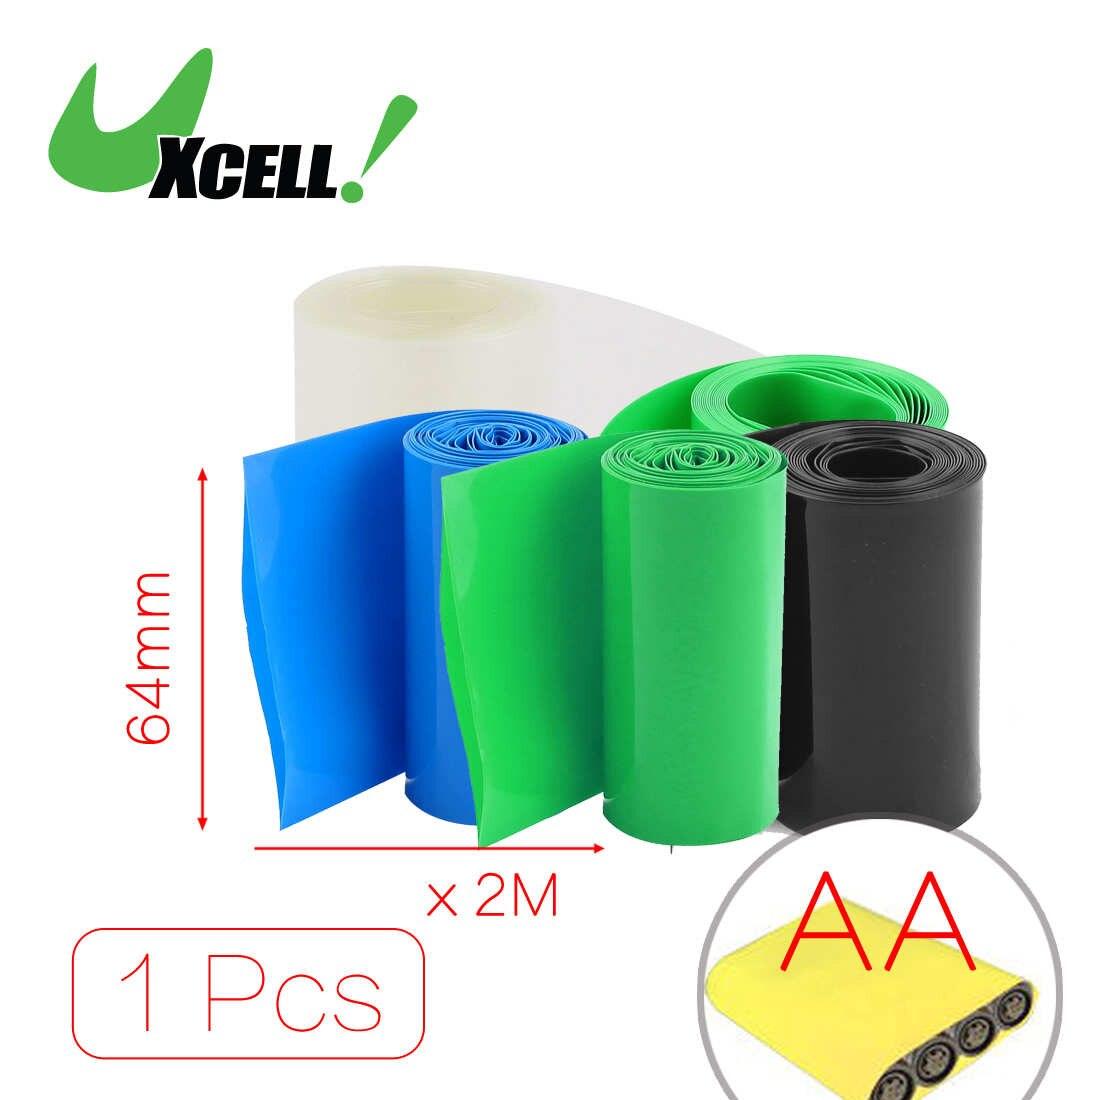 Uxcell 1 Uds 2 metros 64mm 67mm 70mm ancho Pvc tubo de plástico termorretráctil negro para paquete de baterías AA Negro Azul verde claro